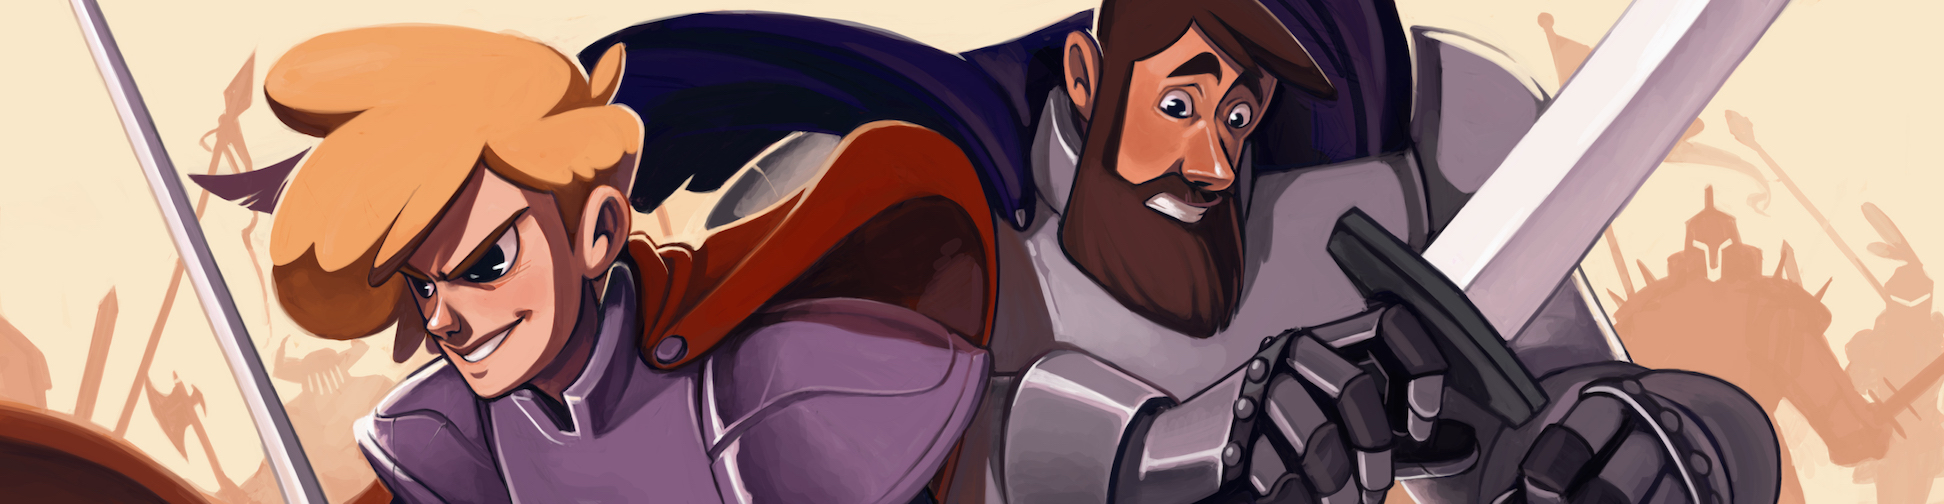 Knight and Beard